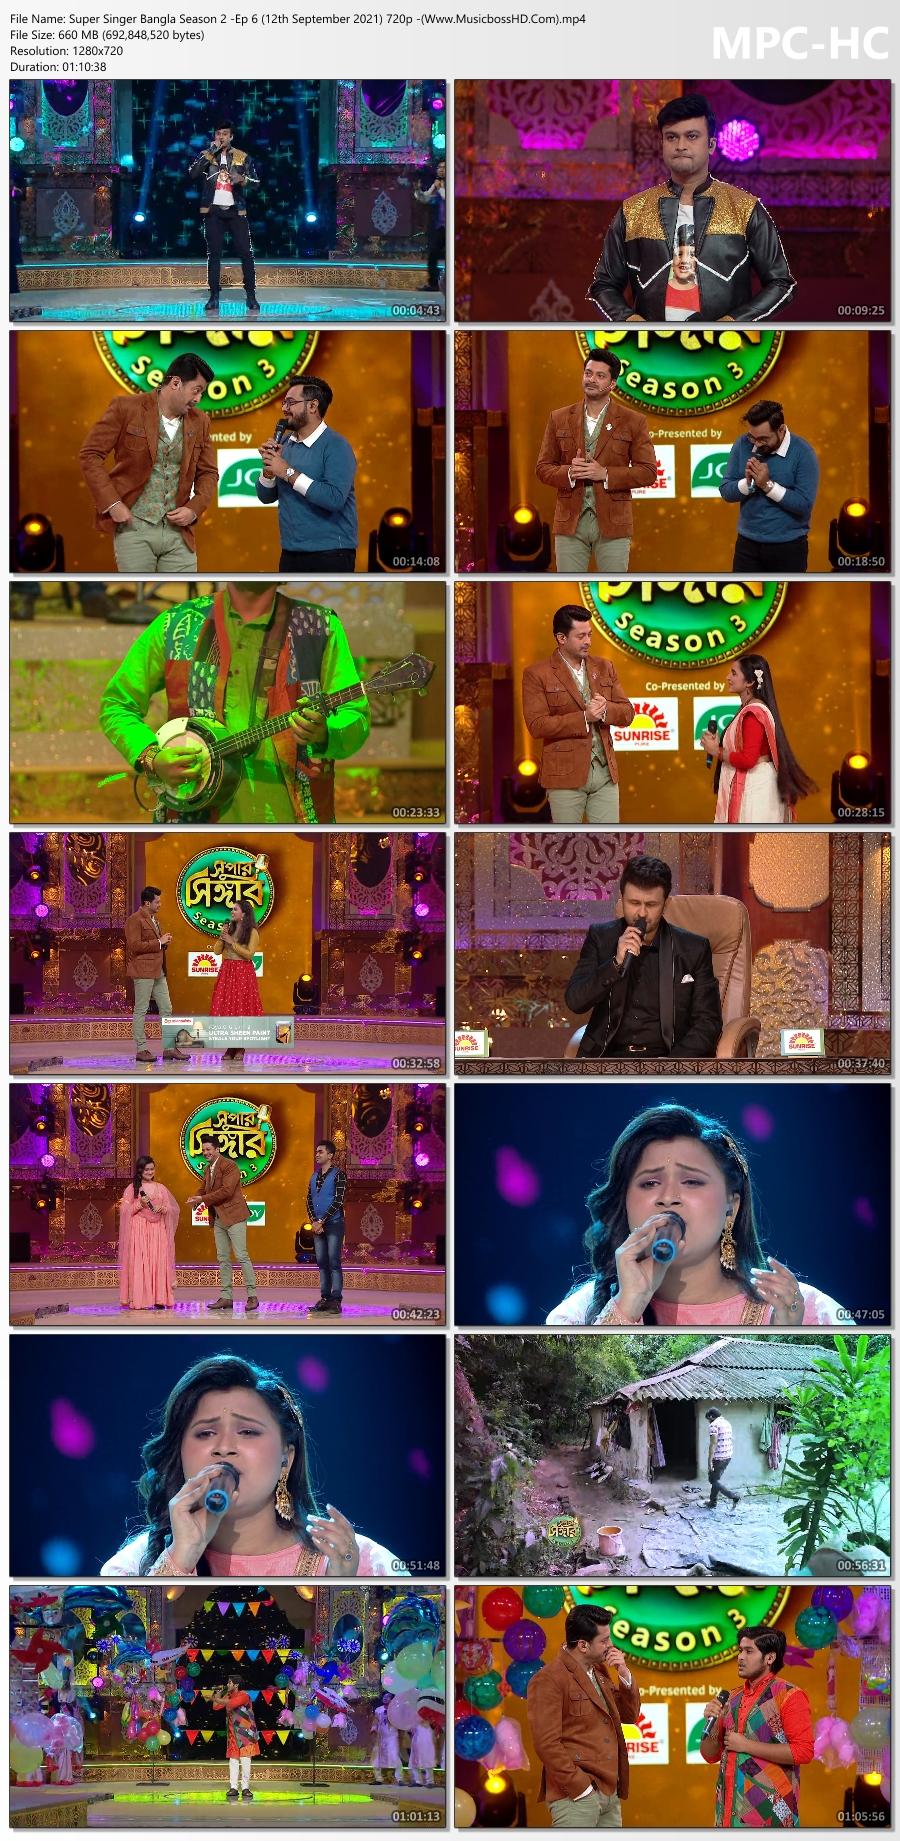 Super-Singer-Bangla-Season-2-Ep-6-12th-September-2021-720p-Www-Musicboss-HD-Com-mp4-thumbs